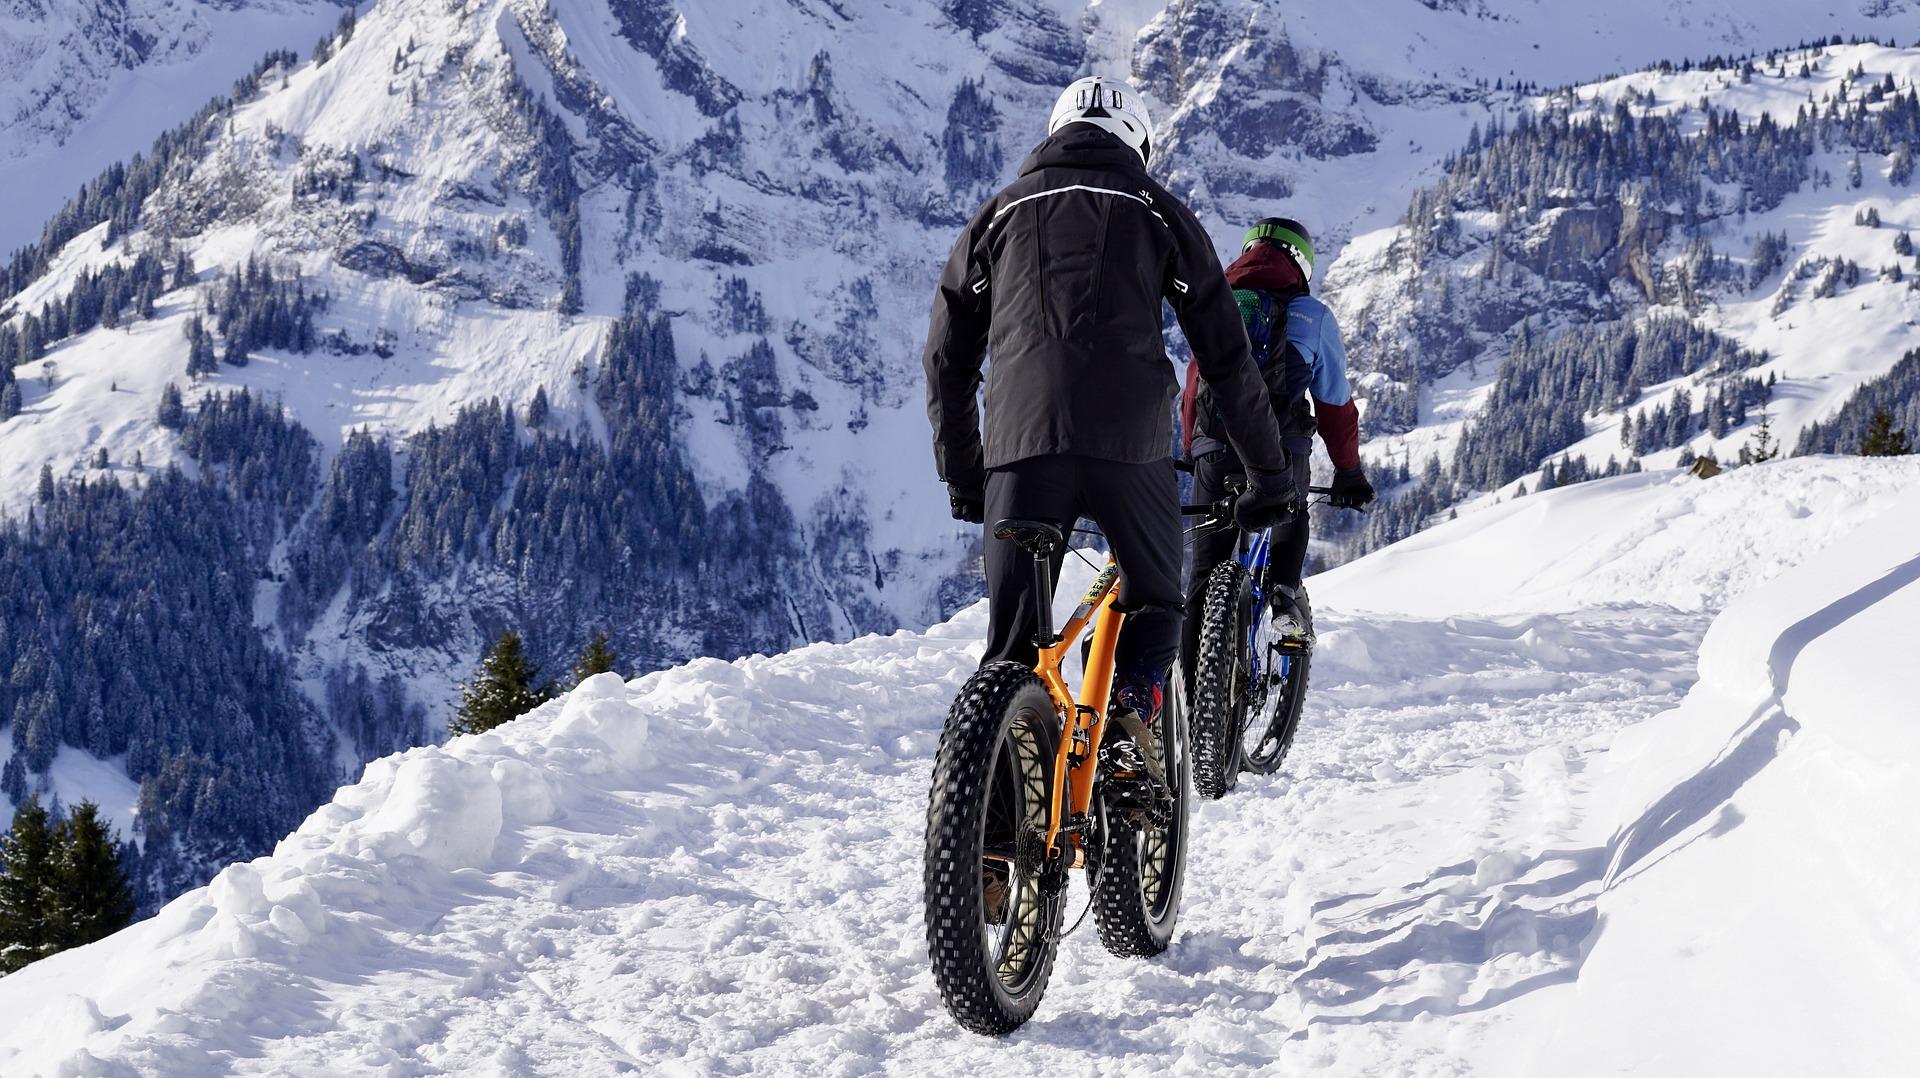 Fat Tire Bike In Snow